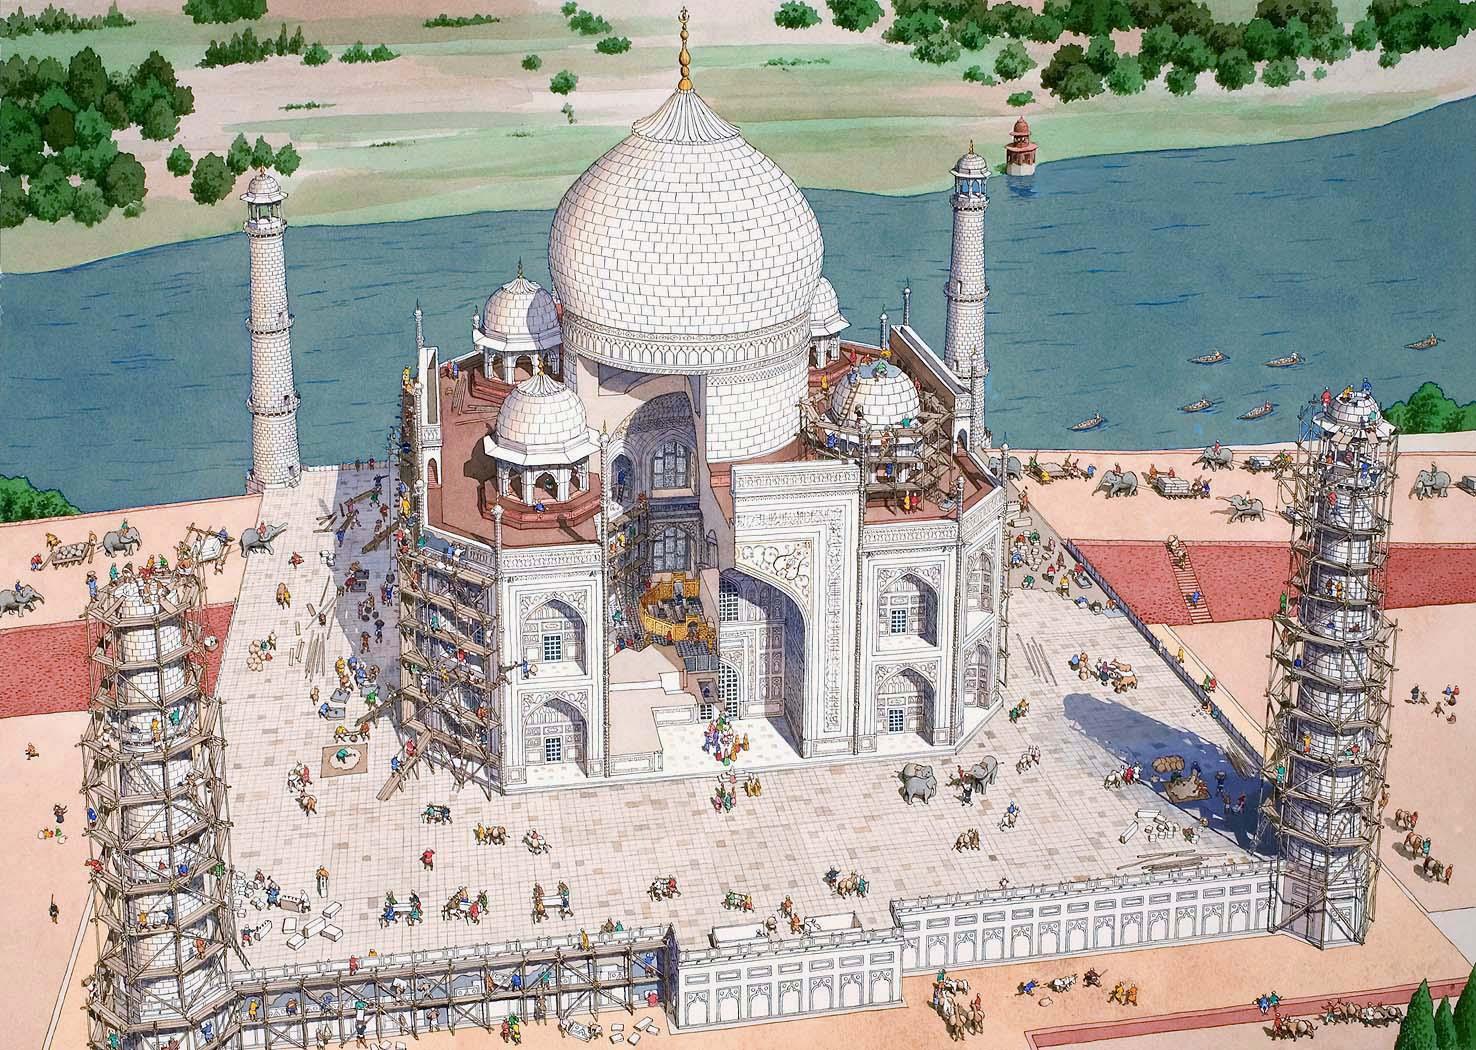 Tajmahal Drawing at GetDrawings.com | Free for personal use Tajmahal ...